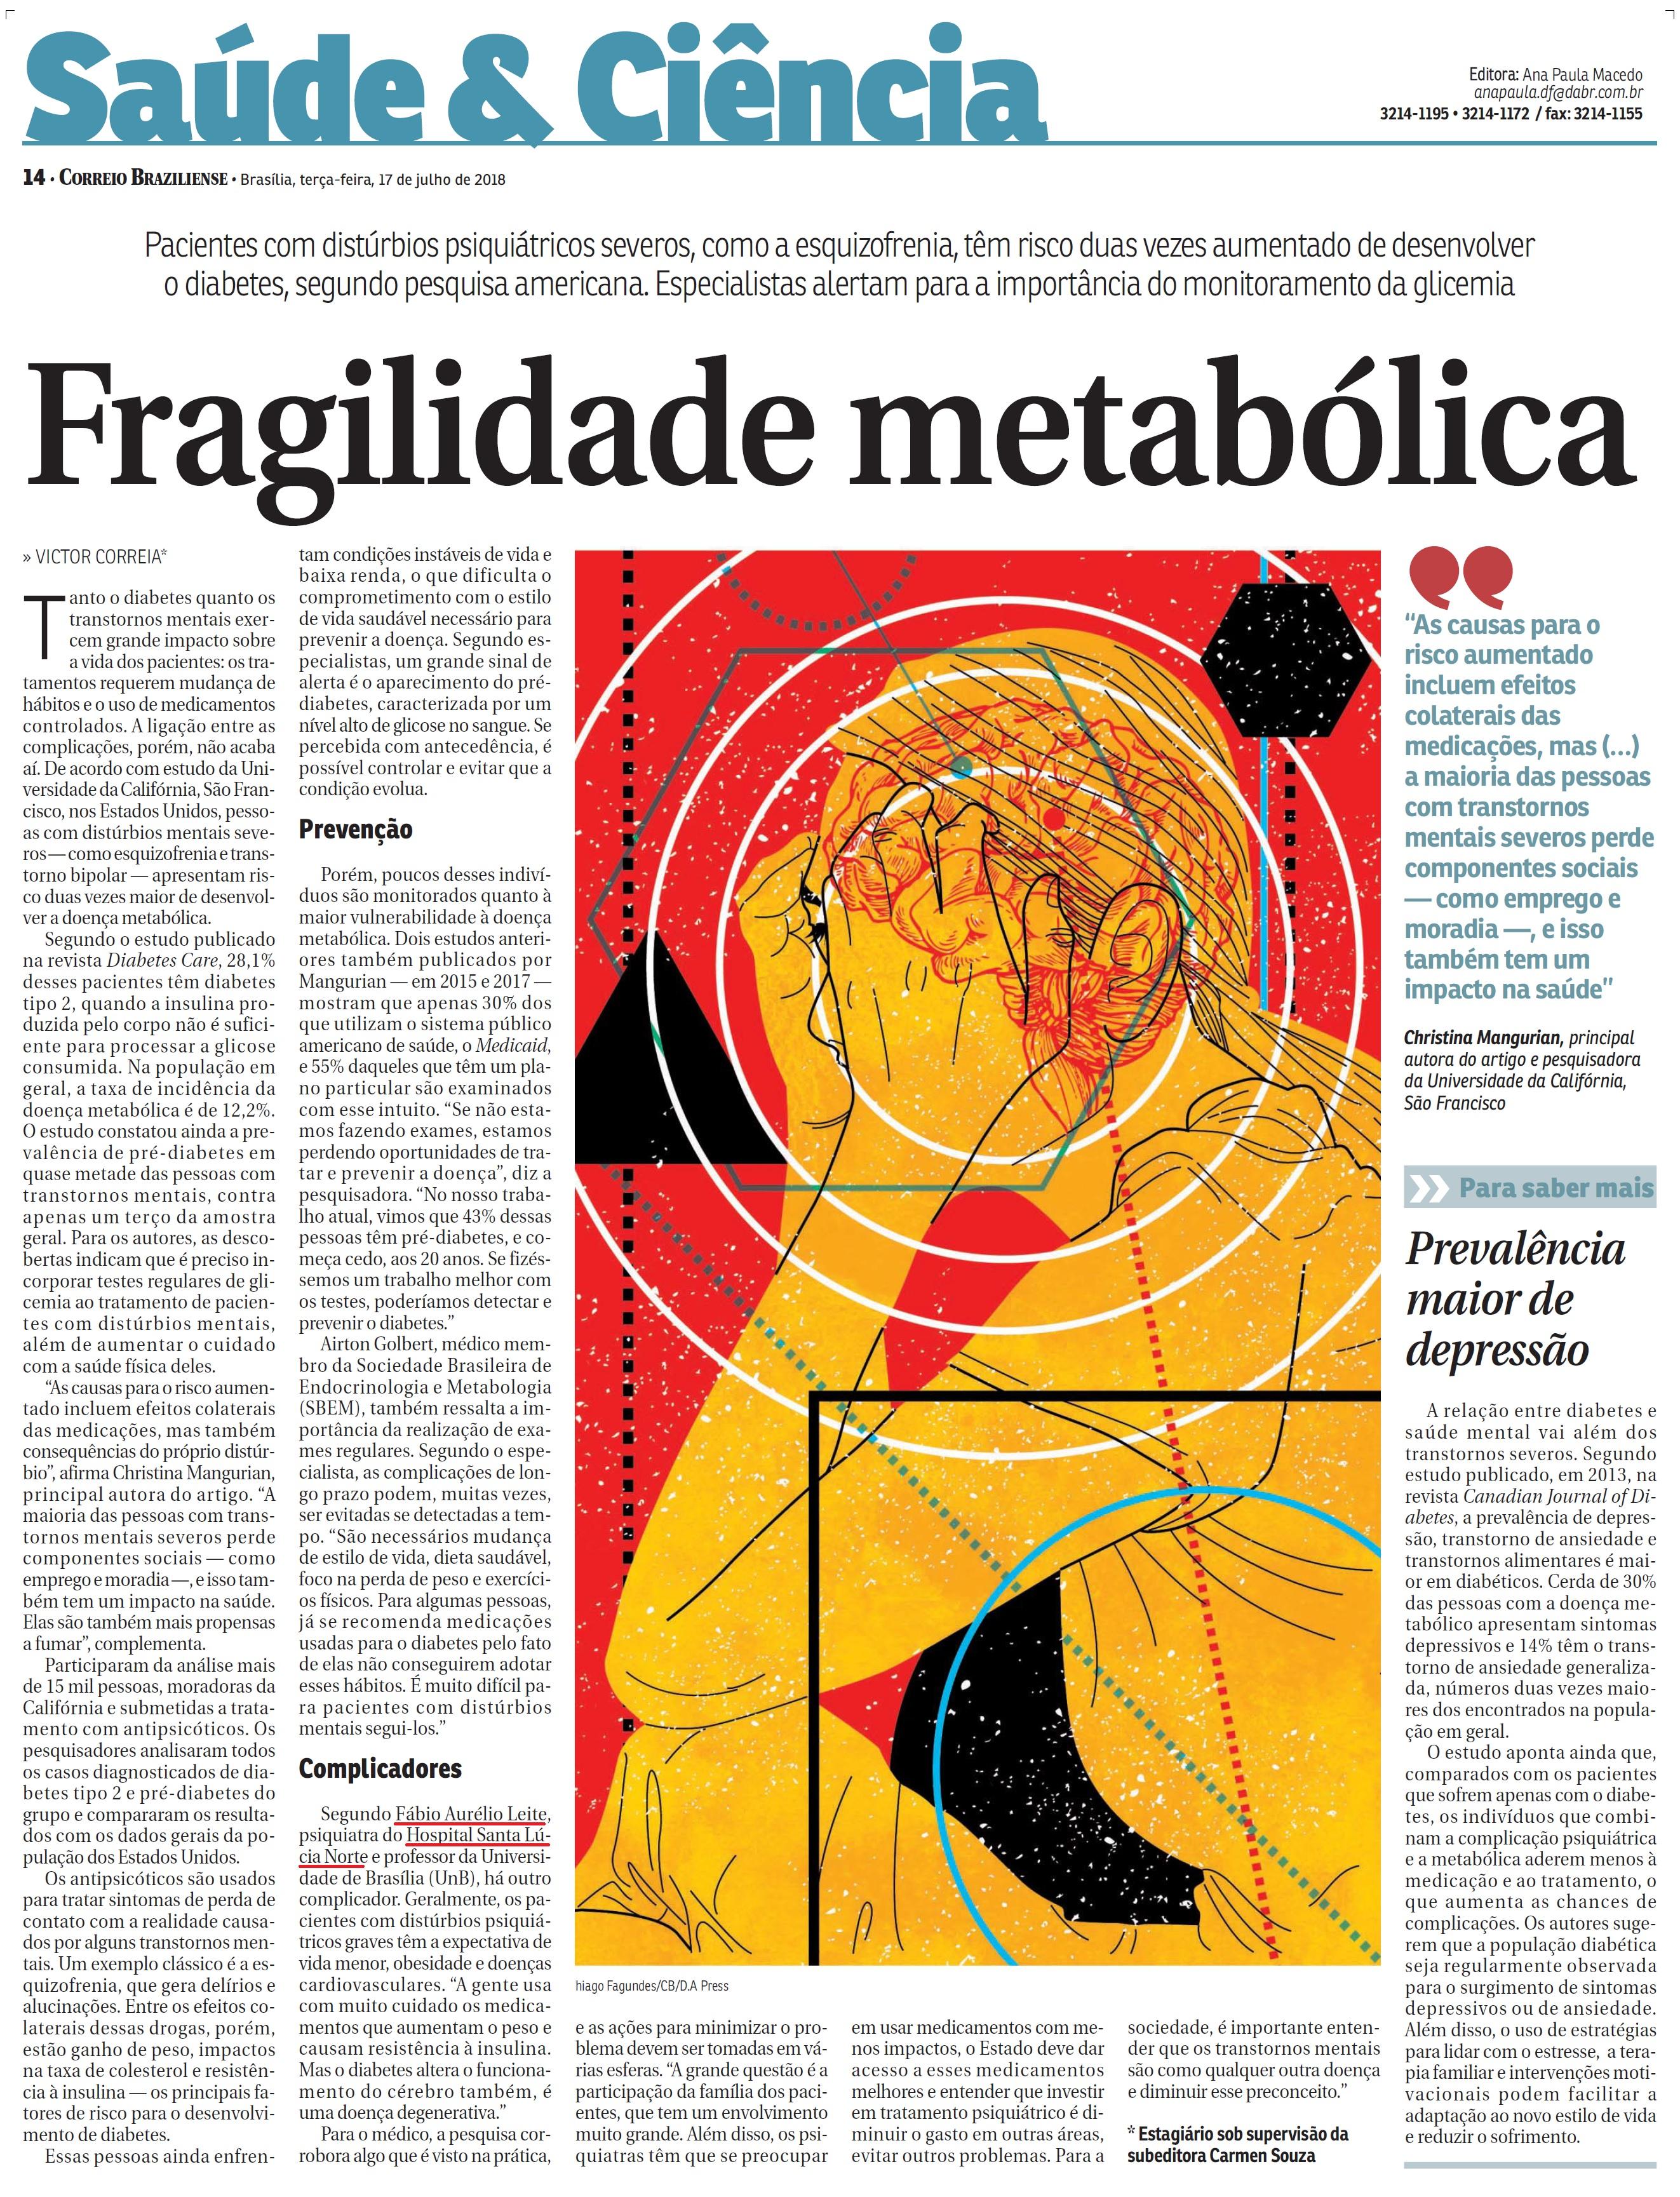 Correio Braziliense - Dr. Fábio Aurélio Leite HSLN - 17-07-2018